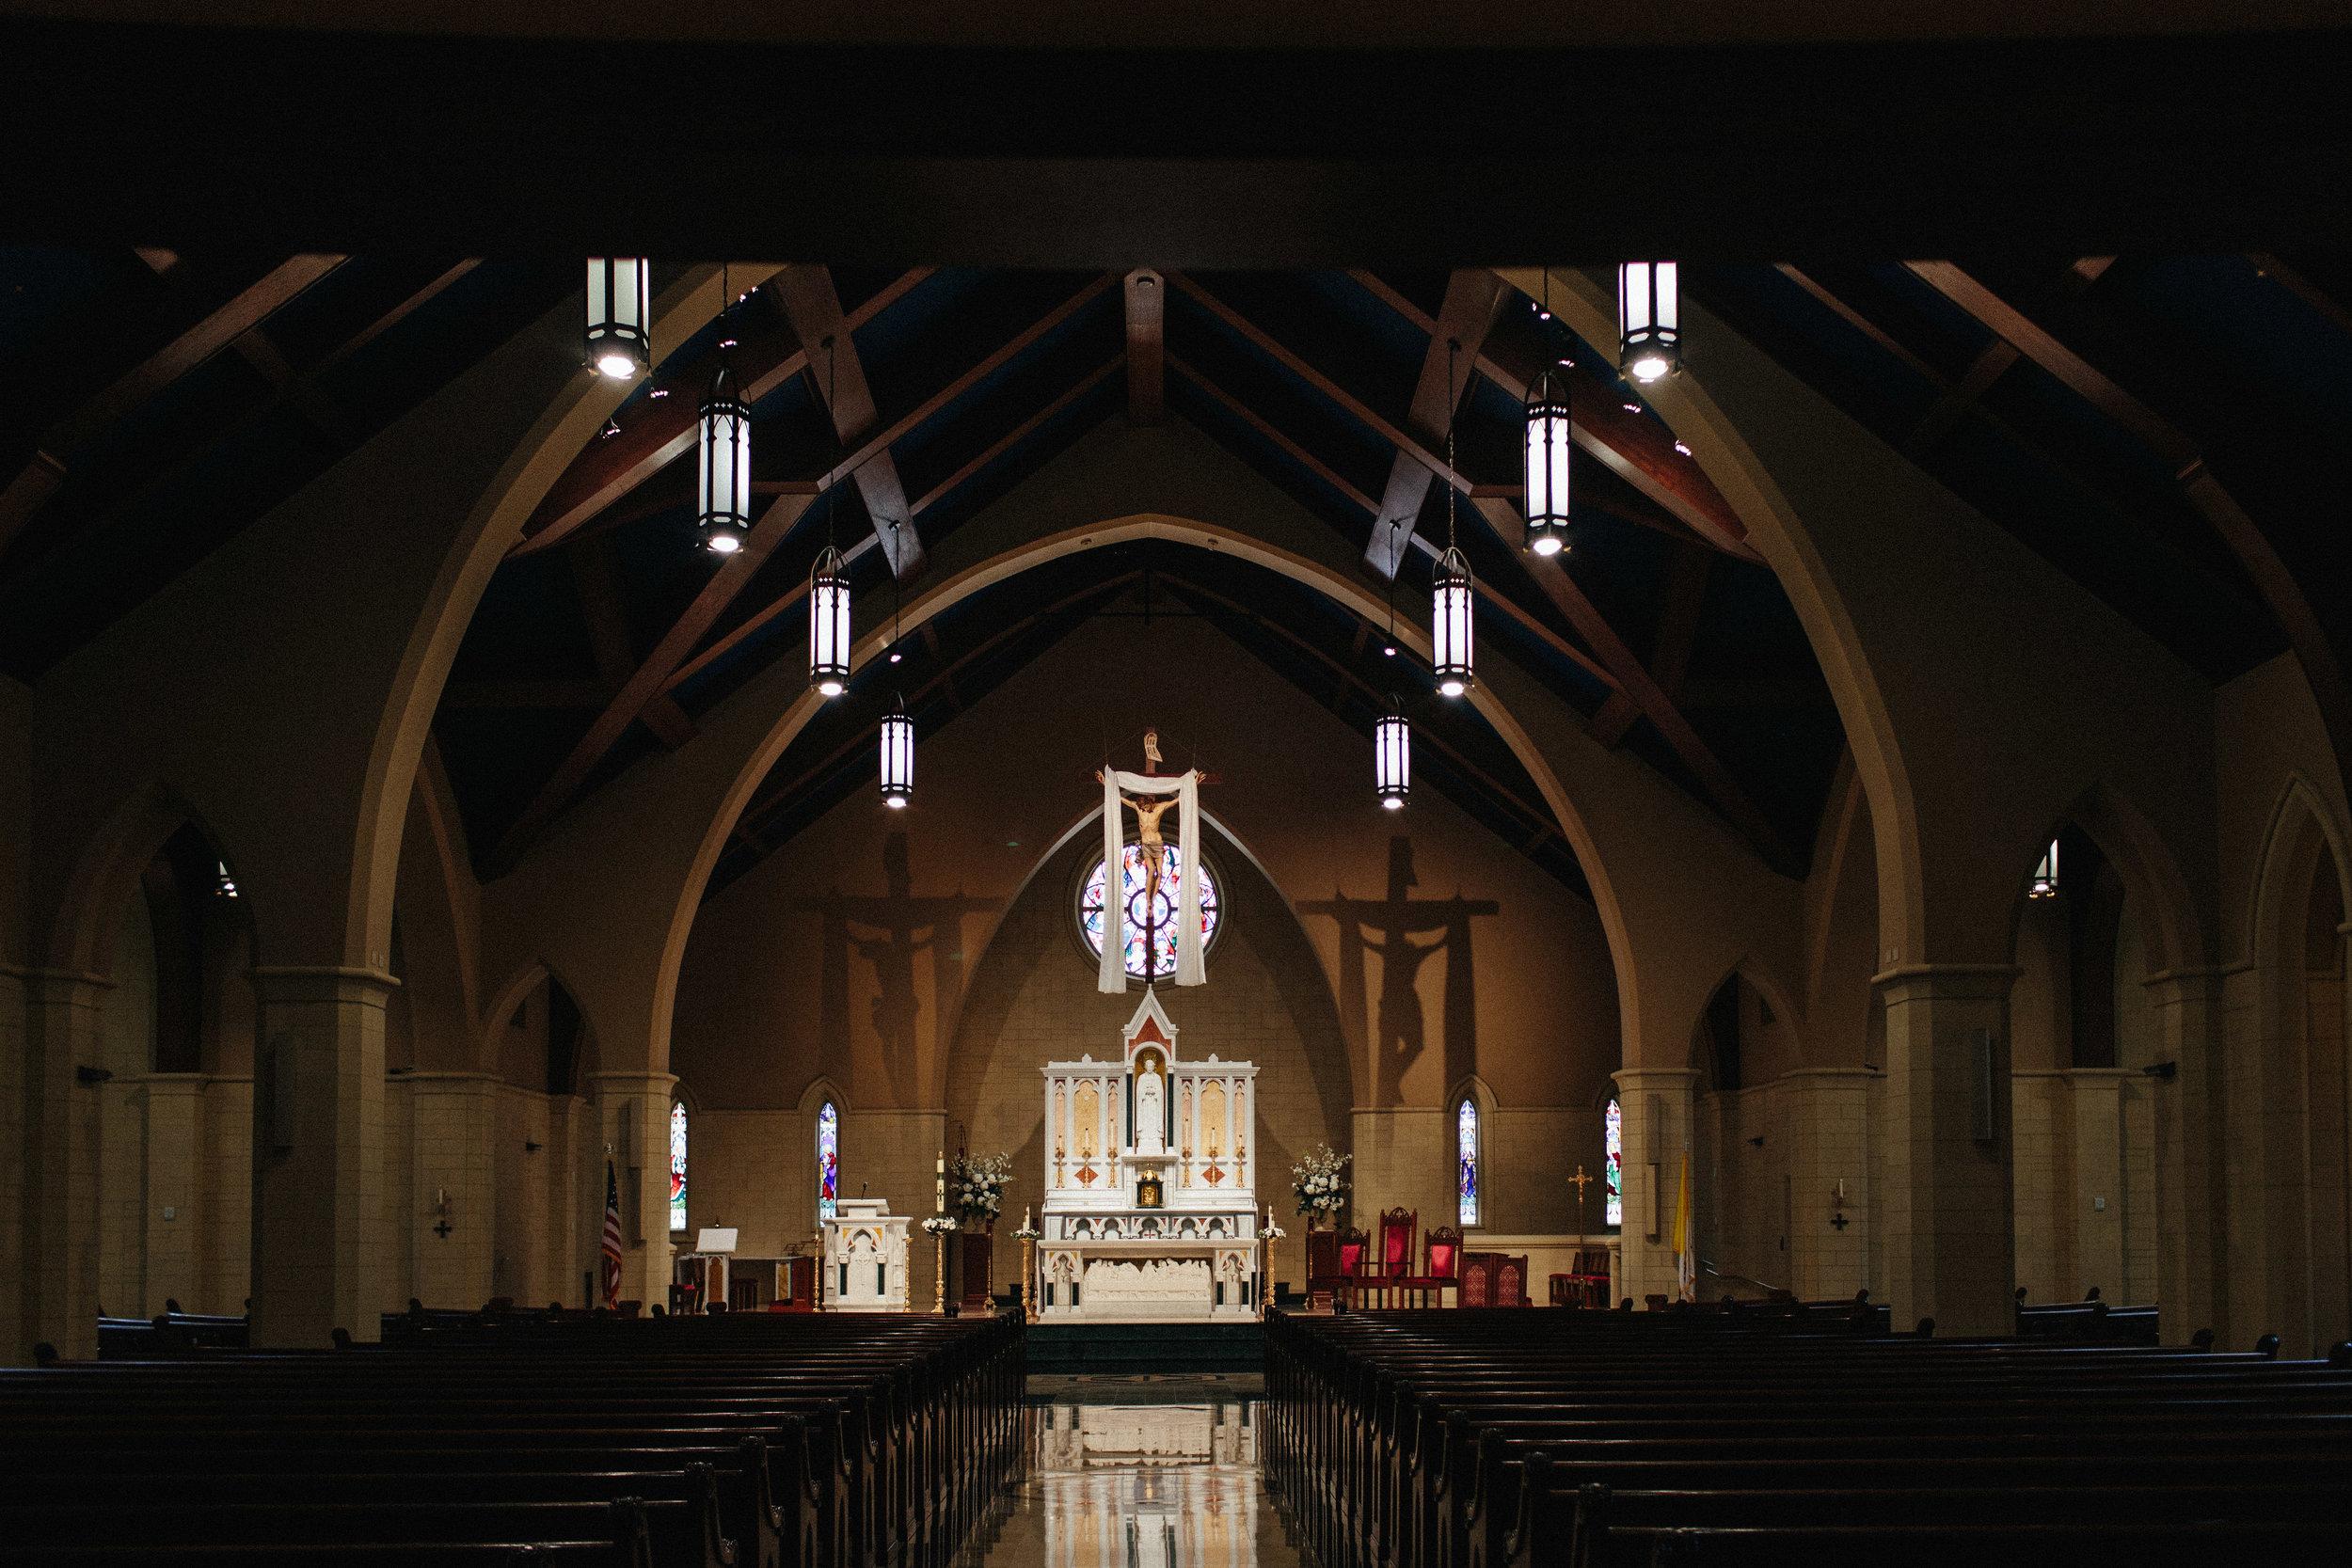 roswell_st_peter_chanel_catholic_avalon_hotel_alpharetta_wedding-1334.jpg